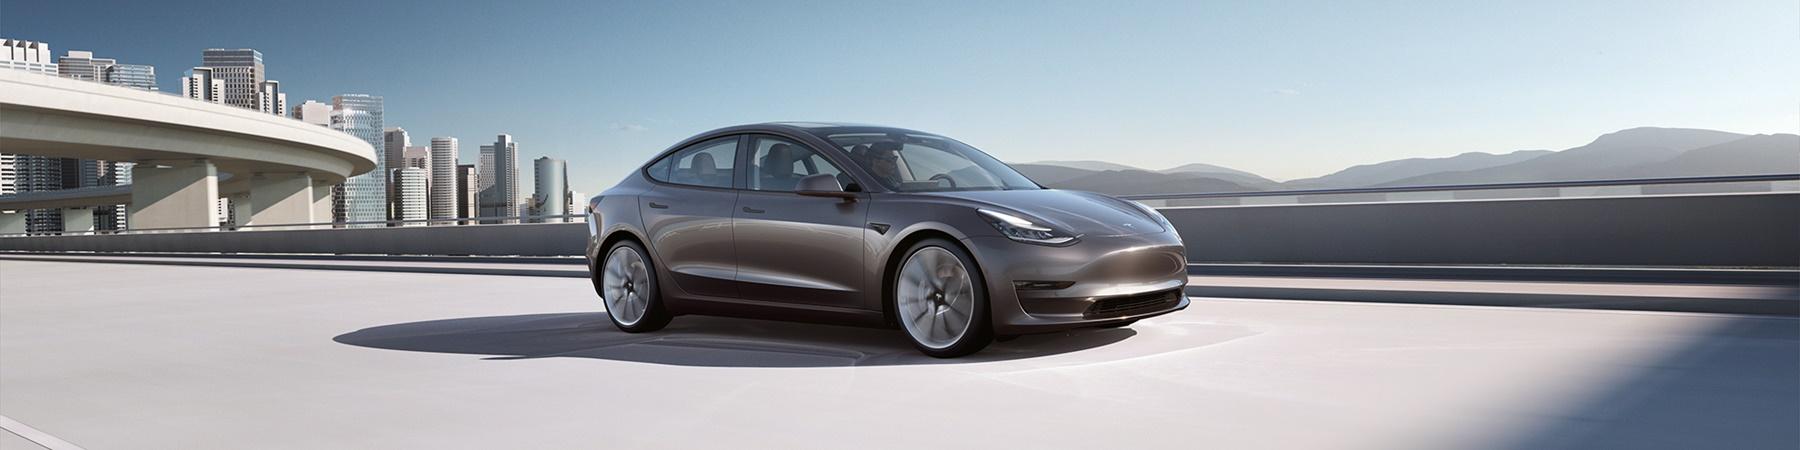 Tesla Model 3 76kWh 482 km actieradius